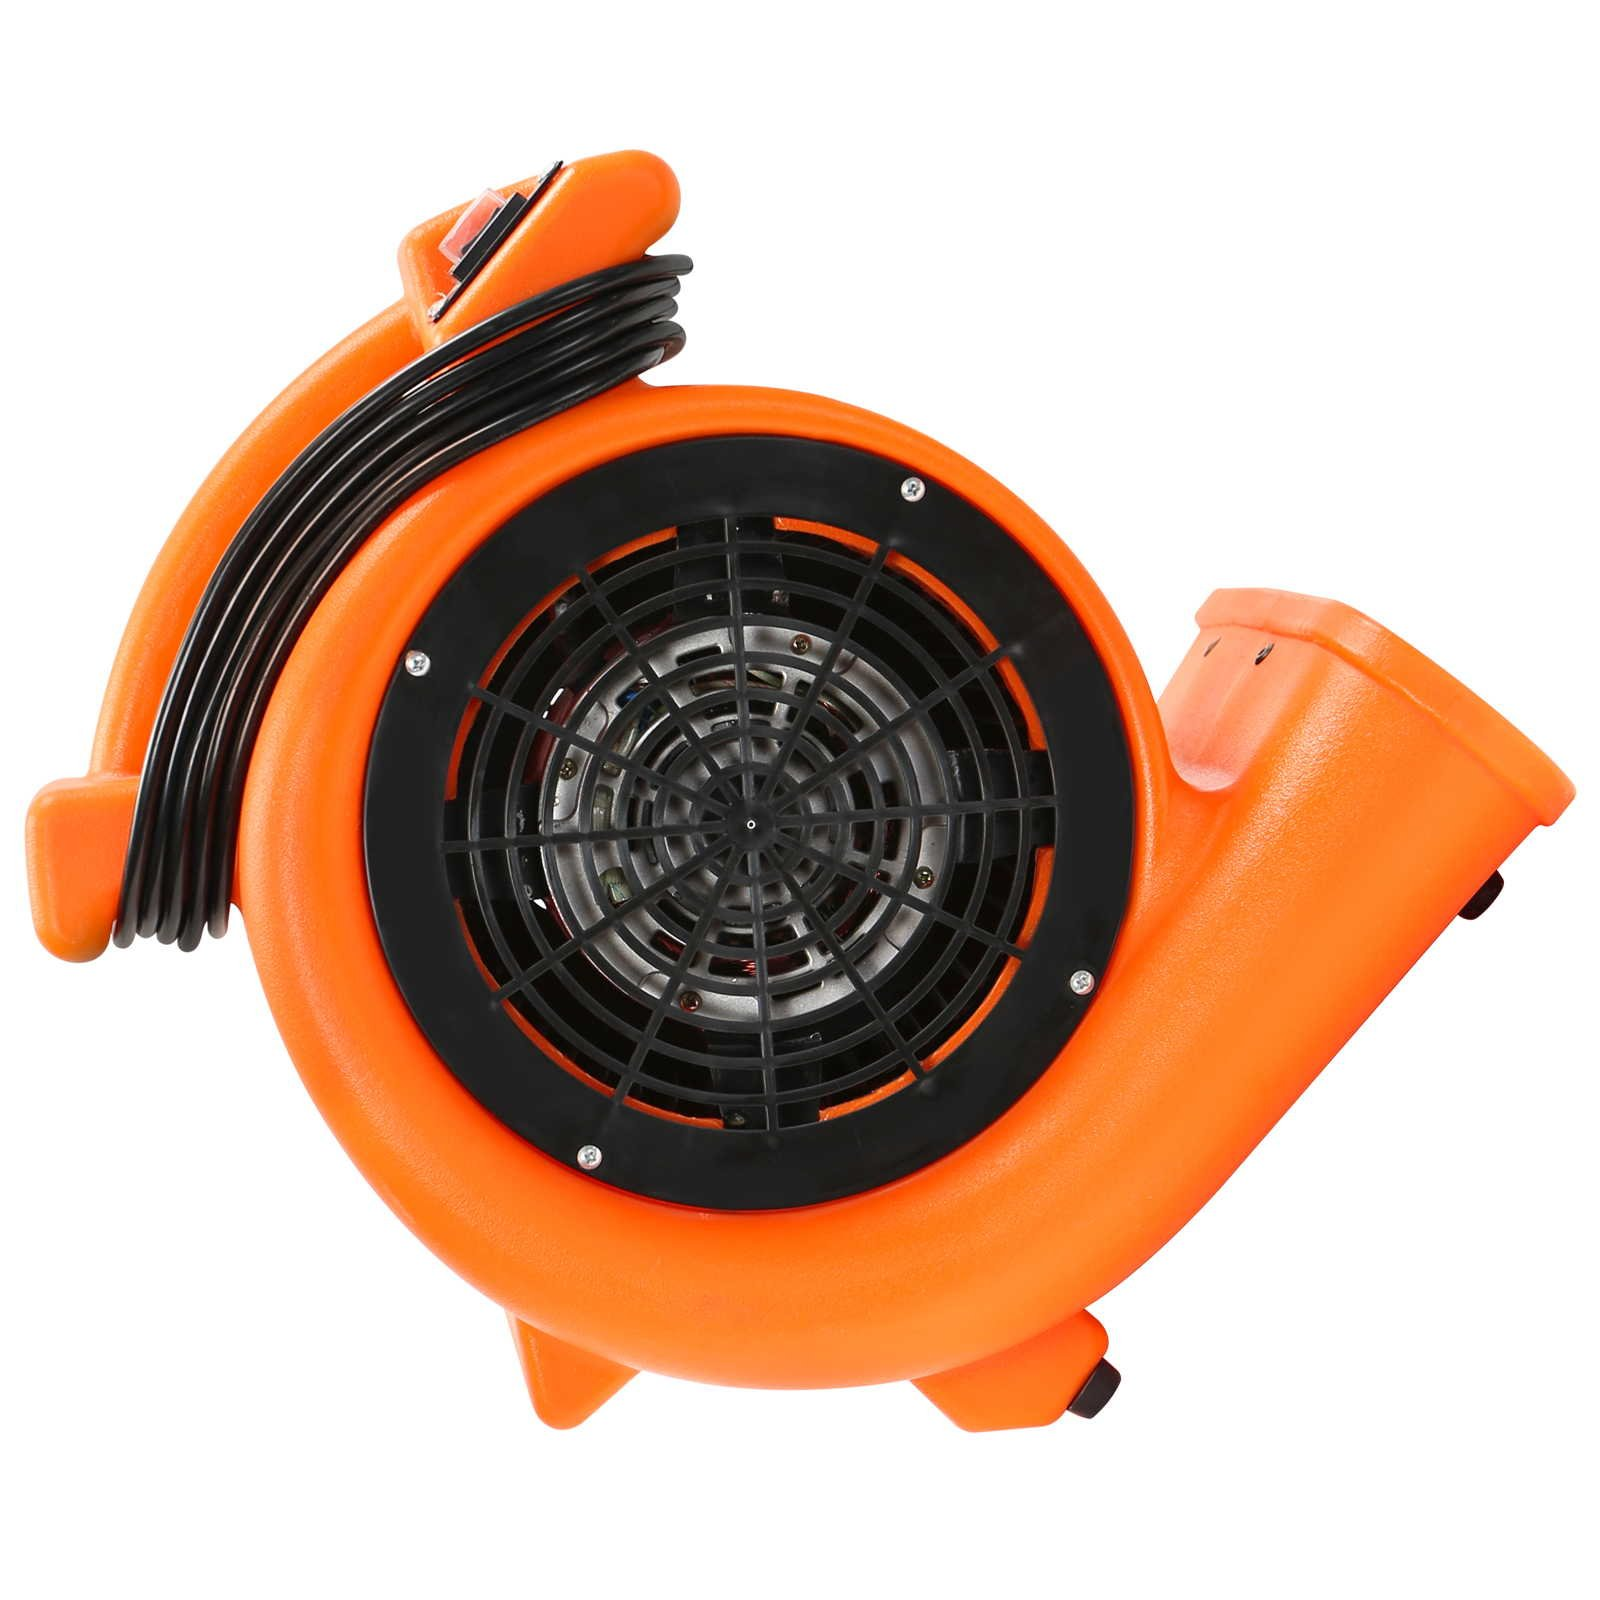 CFM Pro Air Mover Carpet Floor Dryer 2 Speed 1/2 HP Blower Fan - Orange - Industrial Water Flood Damage Restoration by CFM Pro (Image #3)